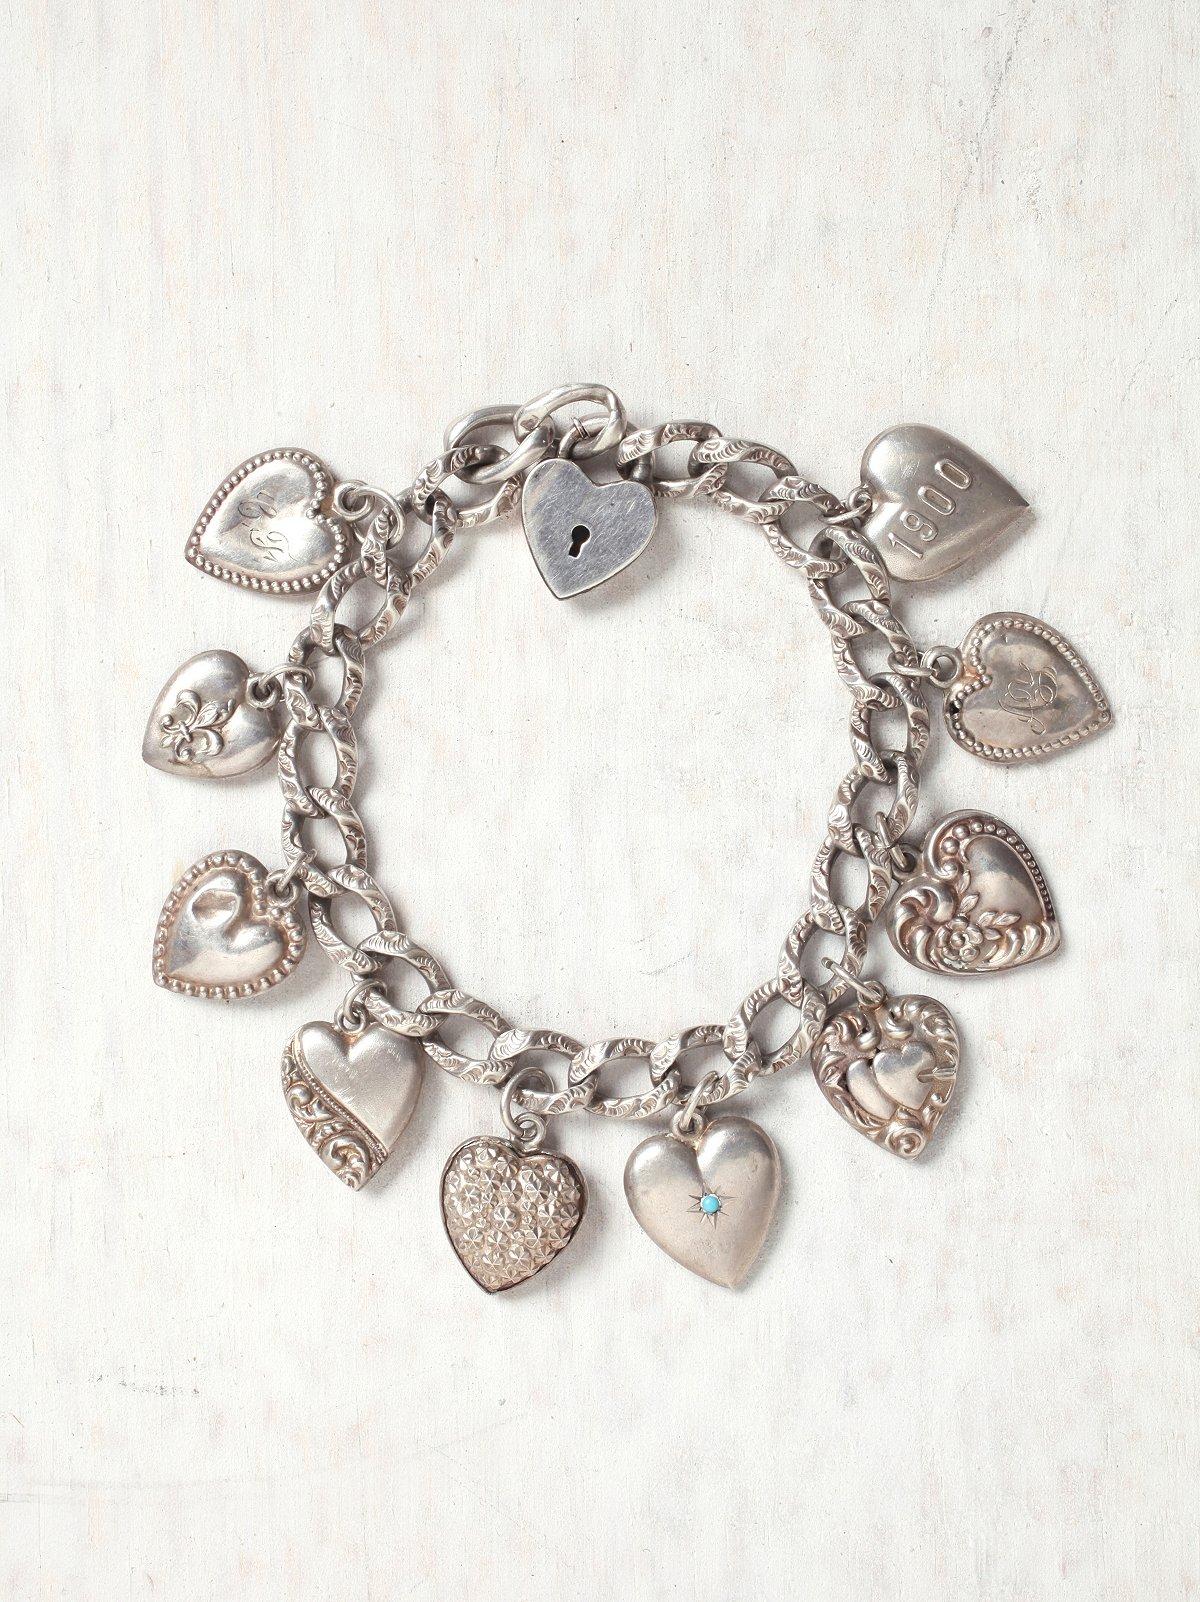 Vintage Victorian Charm Bracelet